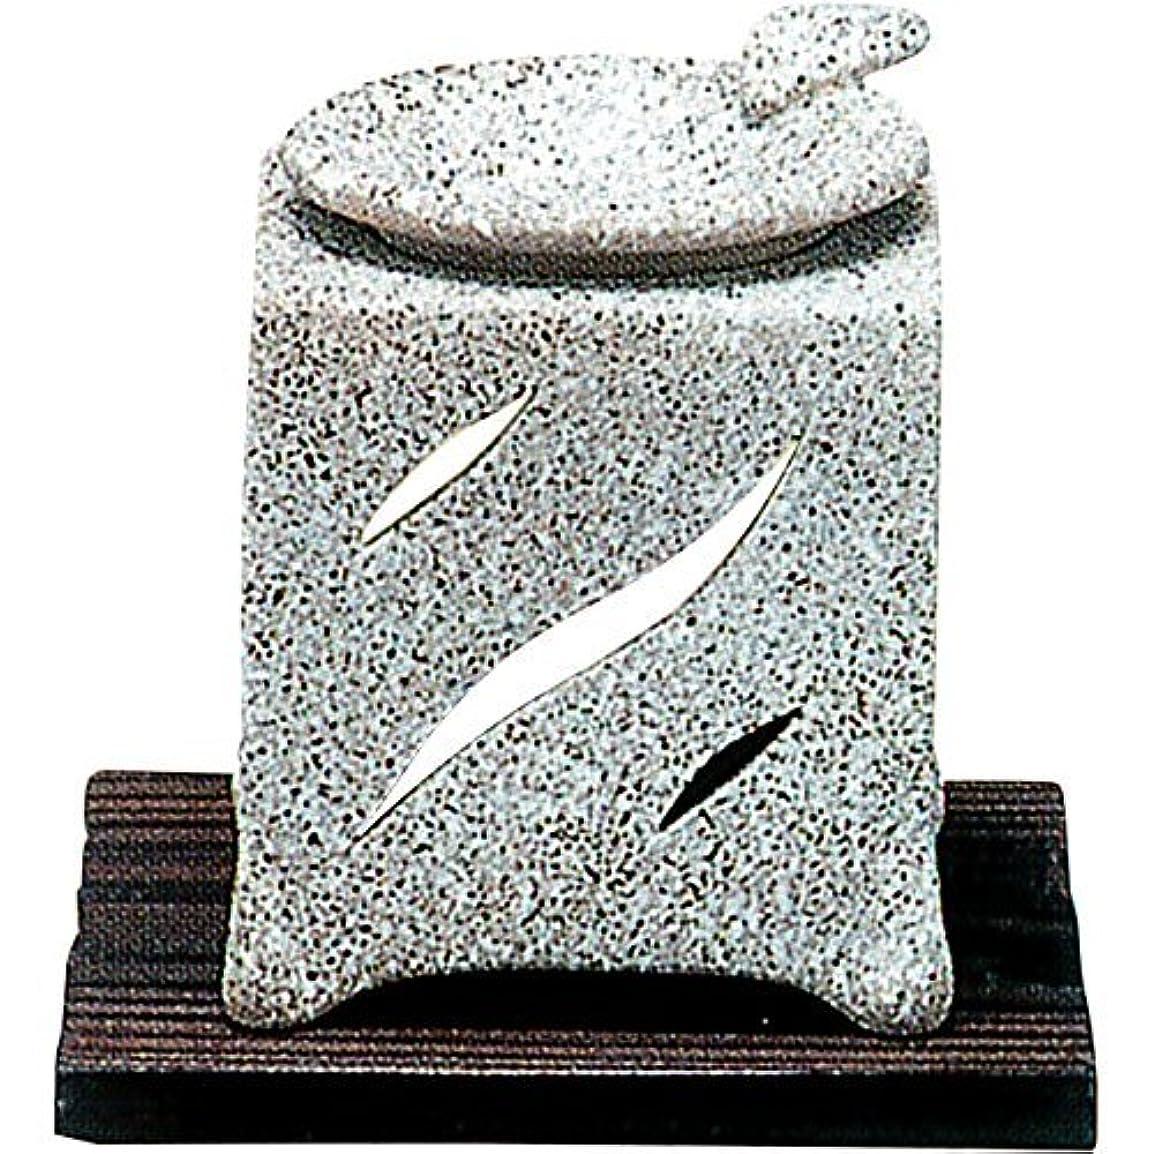 音声報奨金スリンク【常滑焼】山房 石風角形茶香炉 石風角形 10×10×H12㎝ 5-261